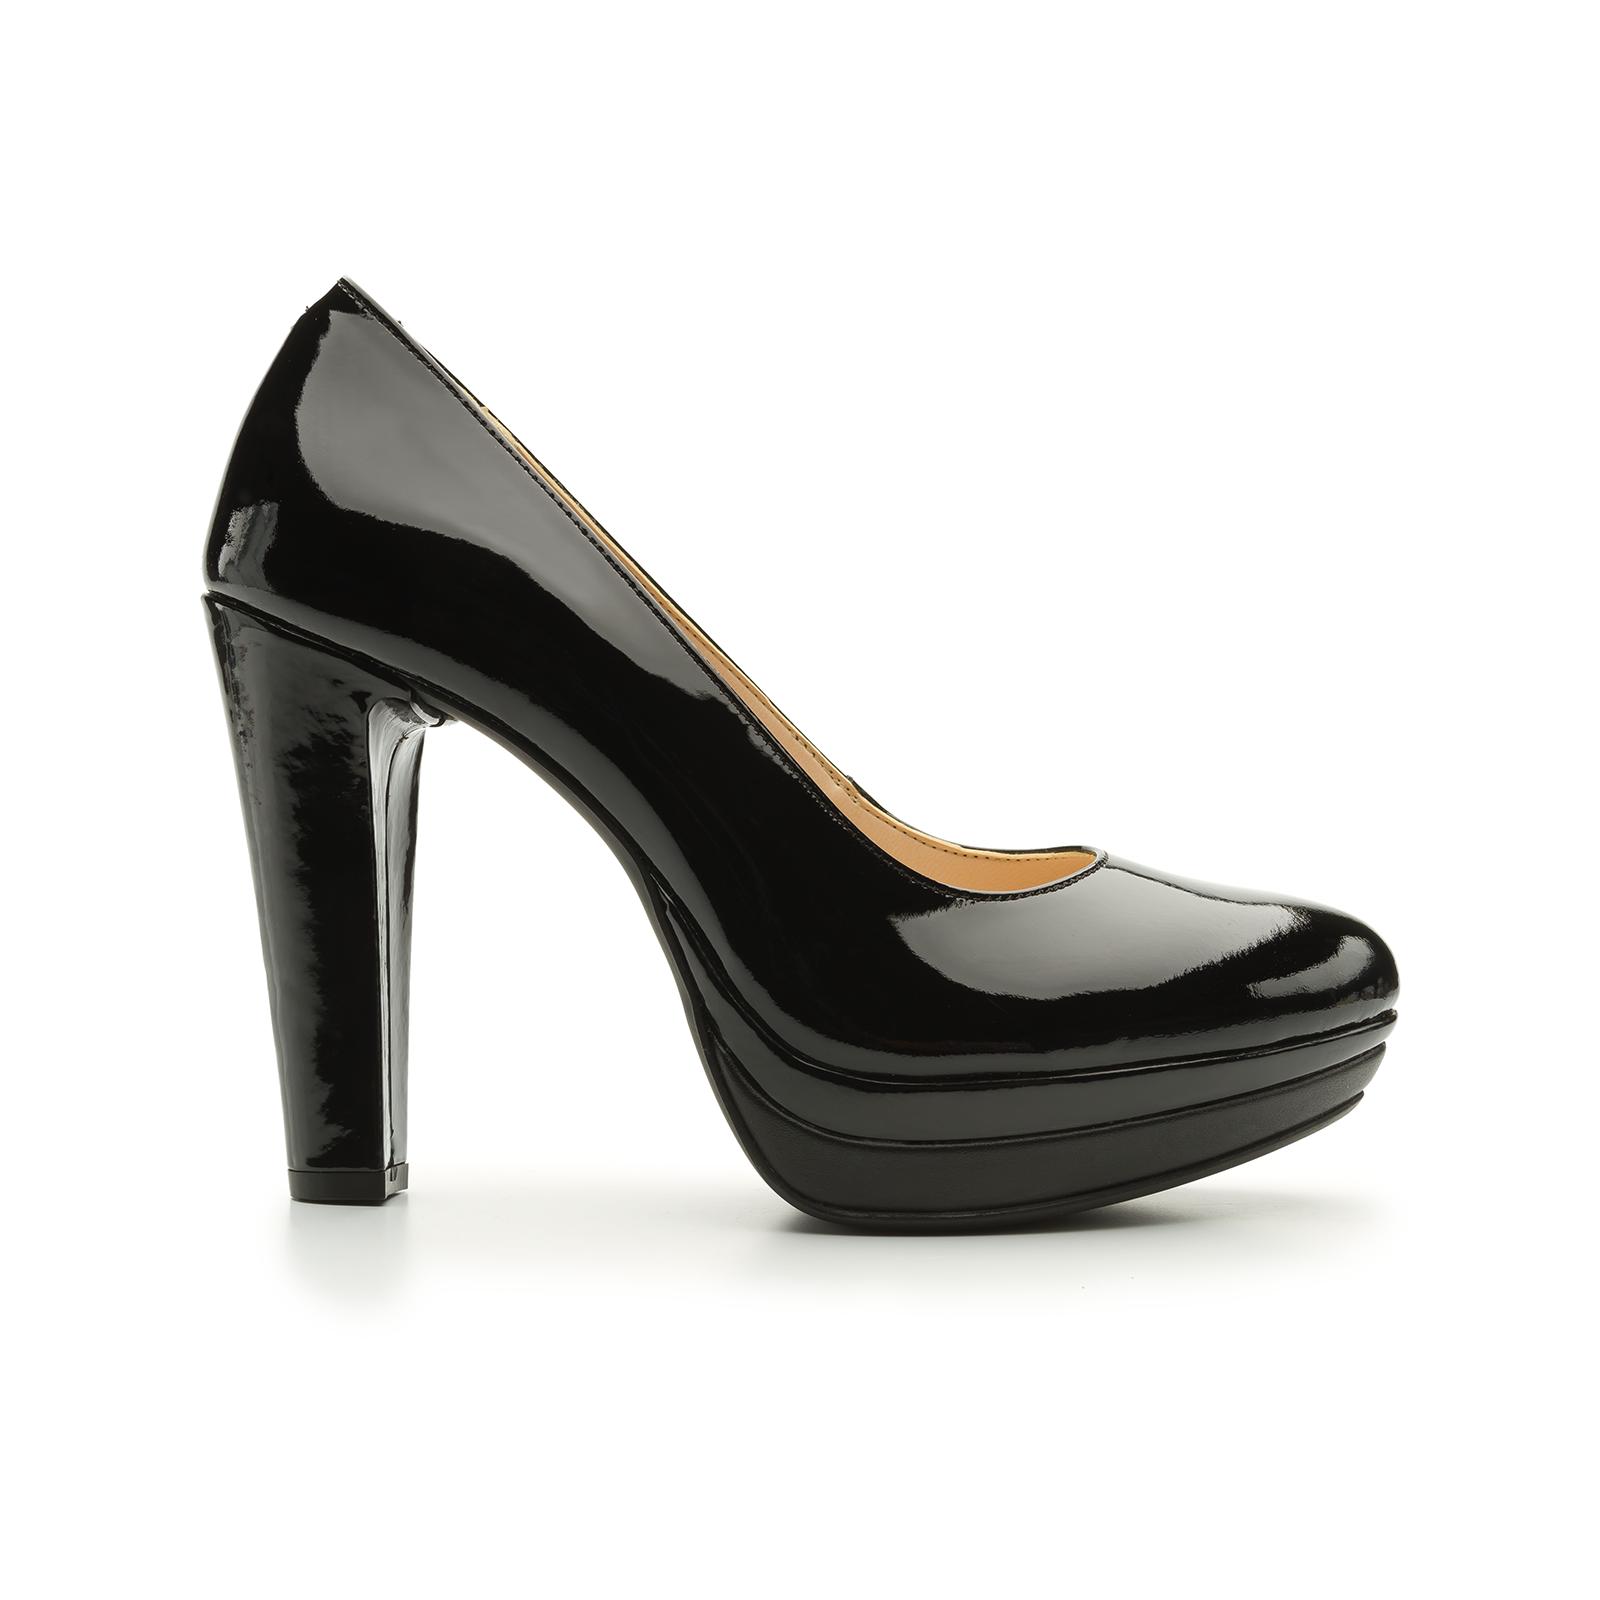 Estilo Flexi 27501 Negro Charol  shoes  zapatos  fashion  moda  goflexi   flexi  clothes  style  estilo  otono  invierno  autumn  winter 15e1d06eb804